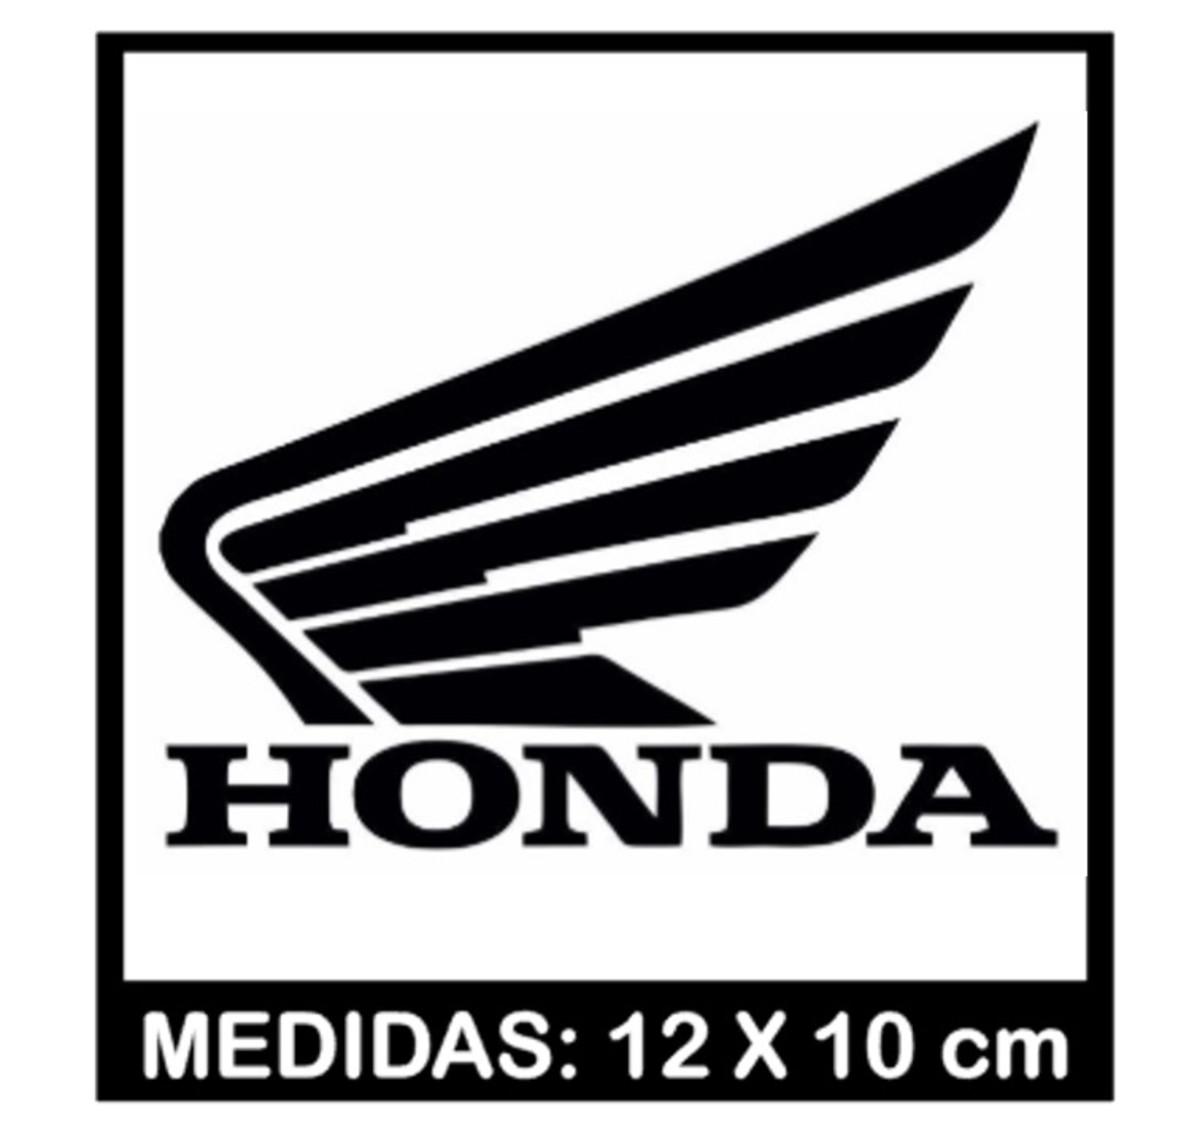 adesivos asas HONDA decorativo para moto personalizado no